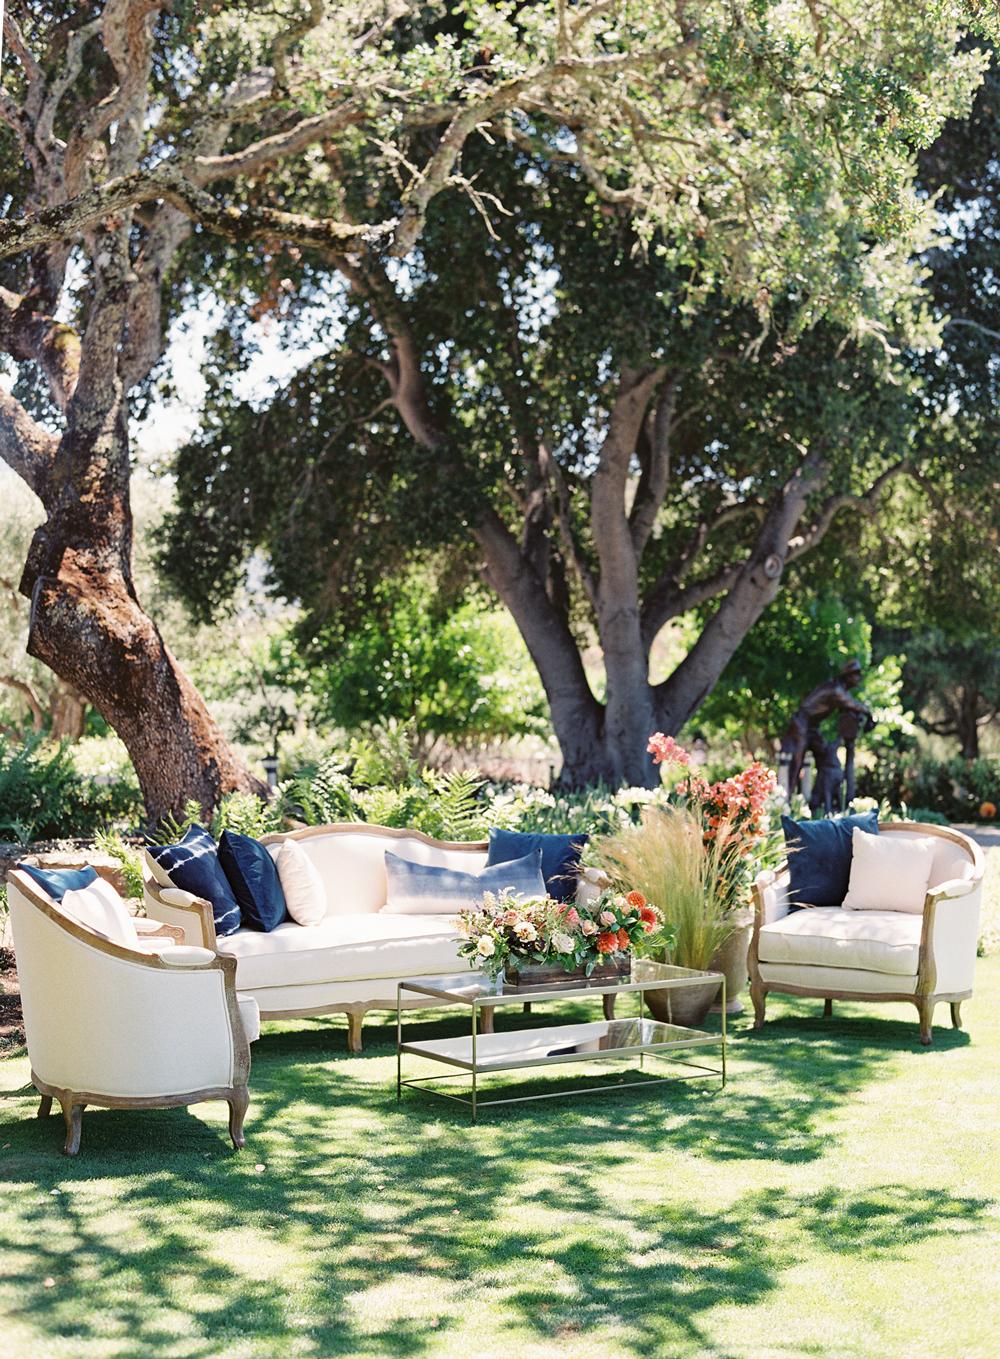 laurie michael wedding lounge beneath trees